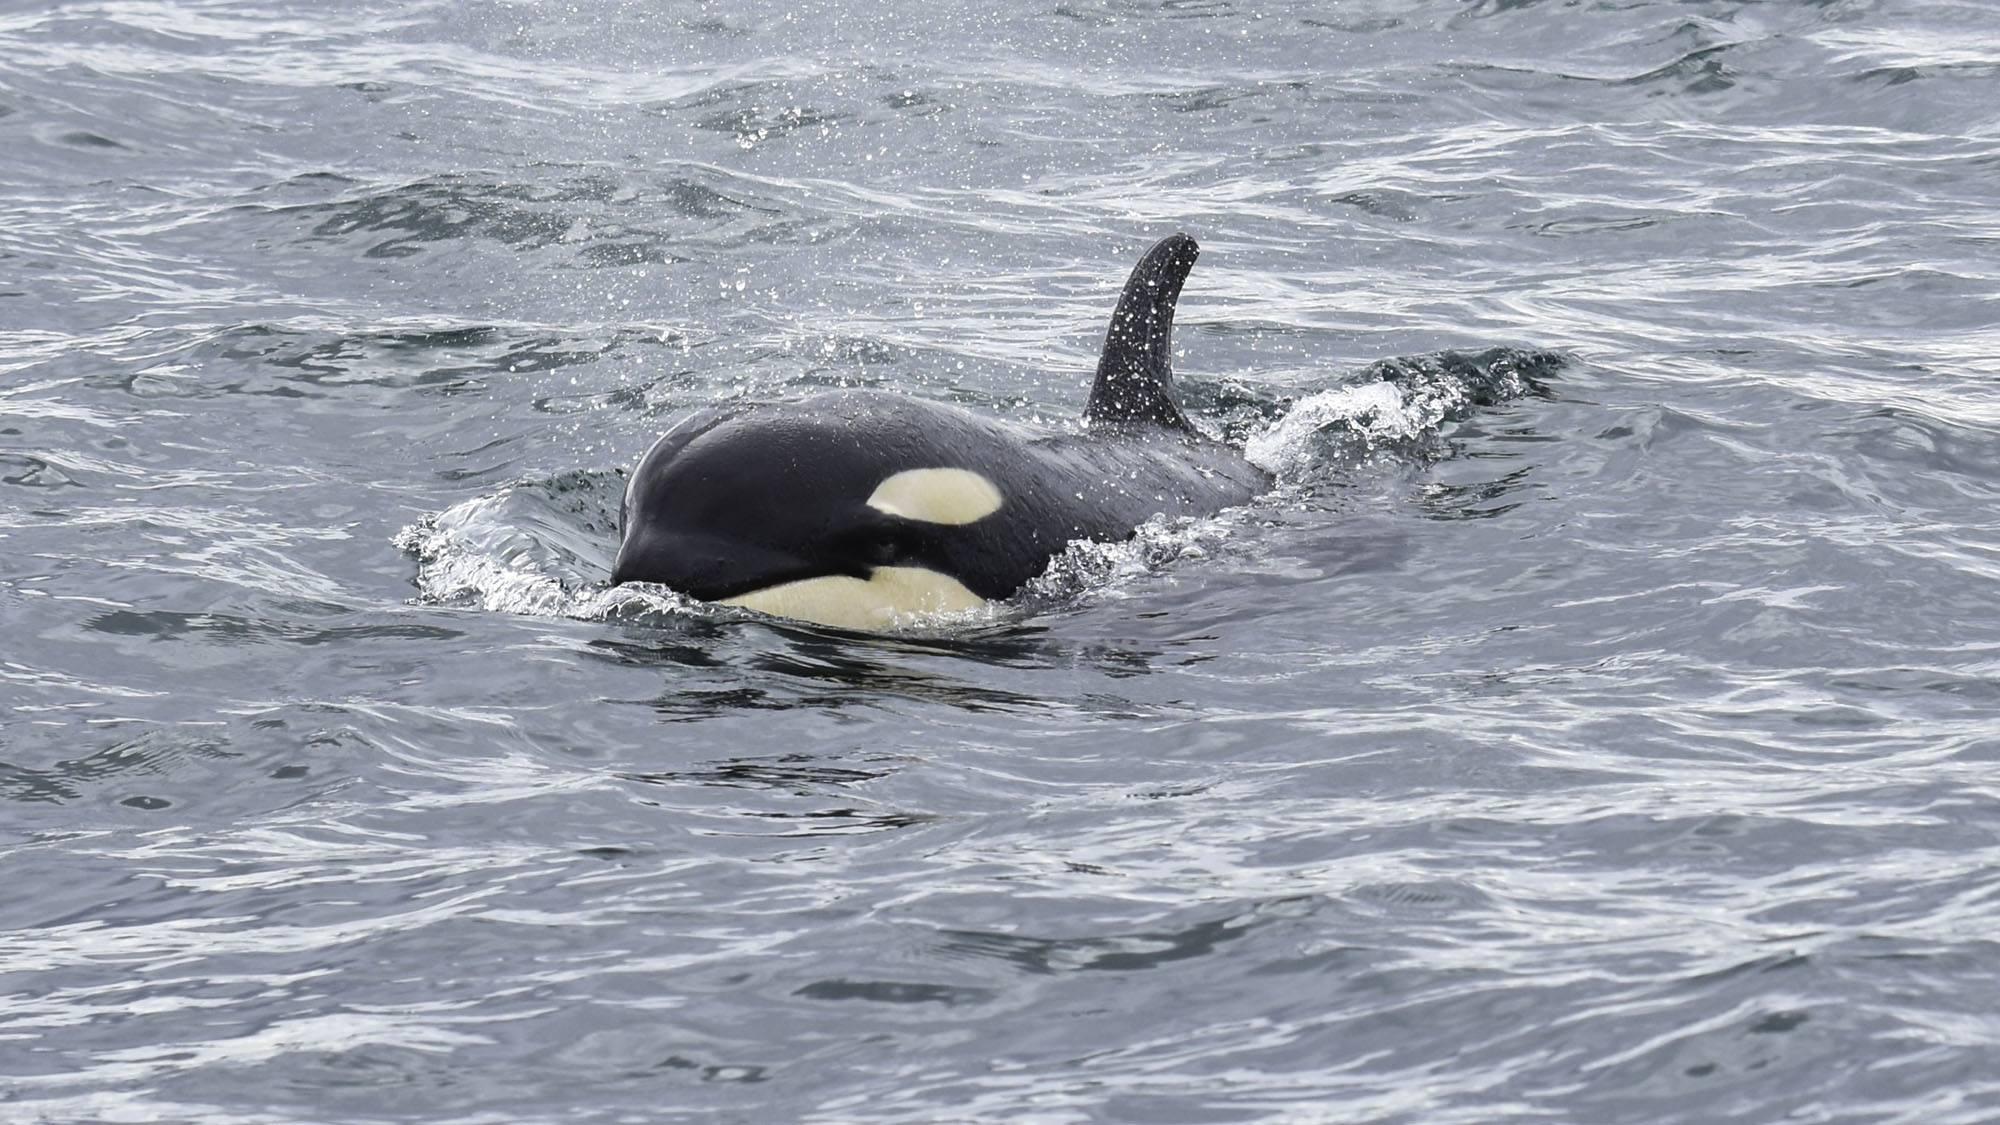 Orca calf Dipper (J54). Photo by Naturalist/Capt Heather MacIntyre, Maya's Legacy Whale Watching, Friday Harbor, WA.